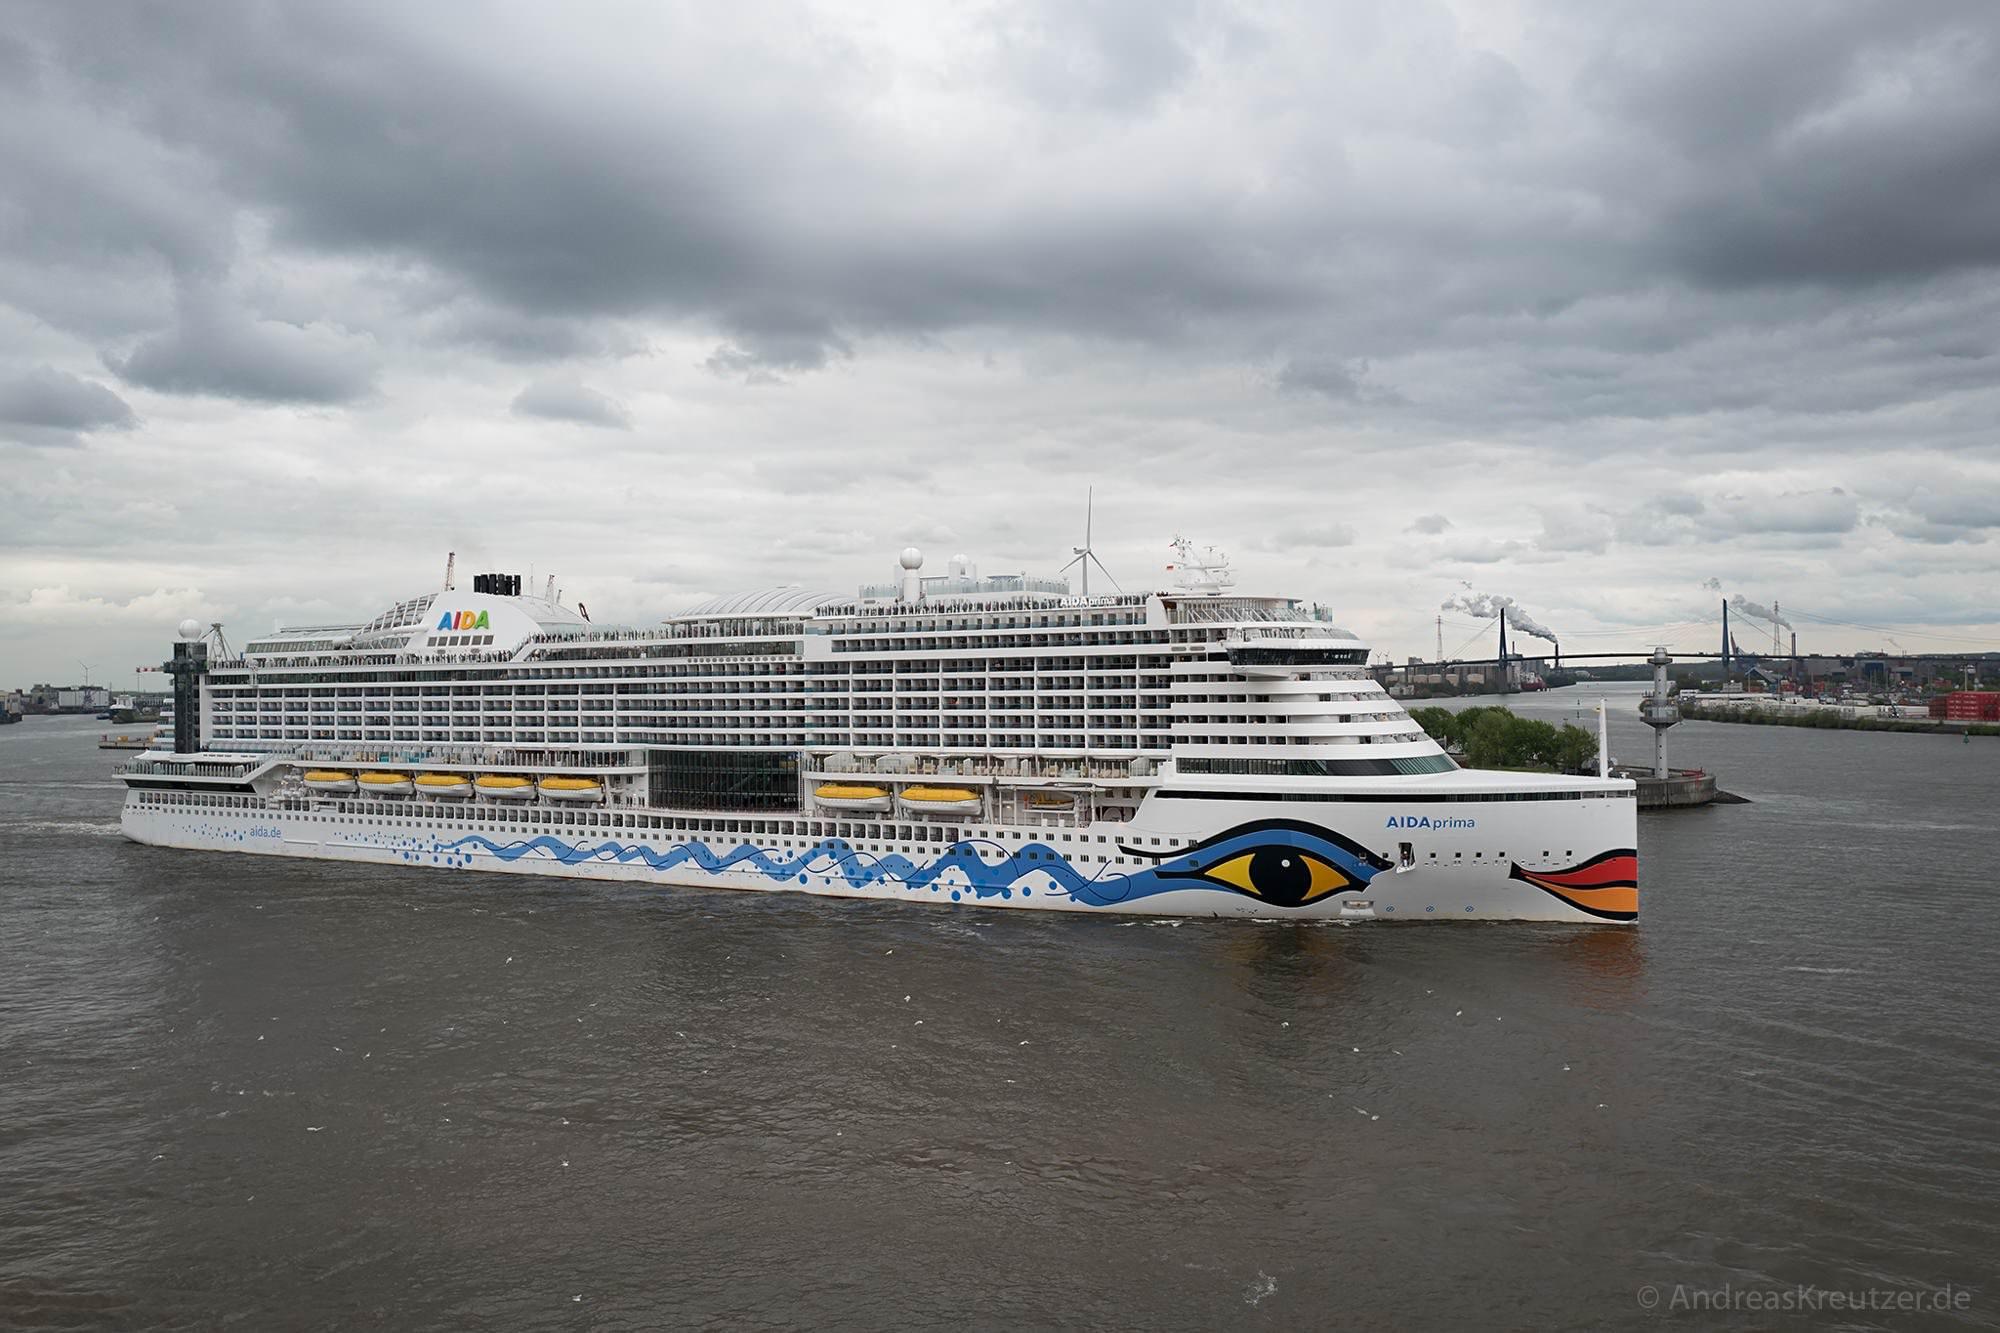 AIDAprima in Hamburg